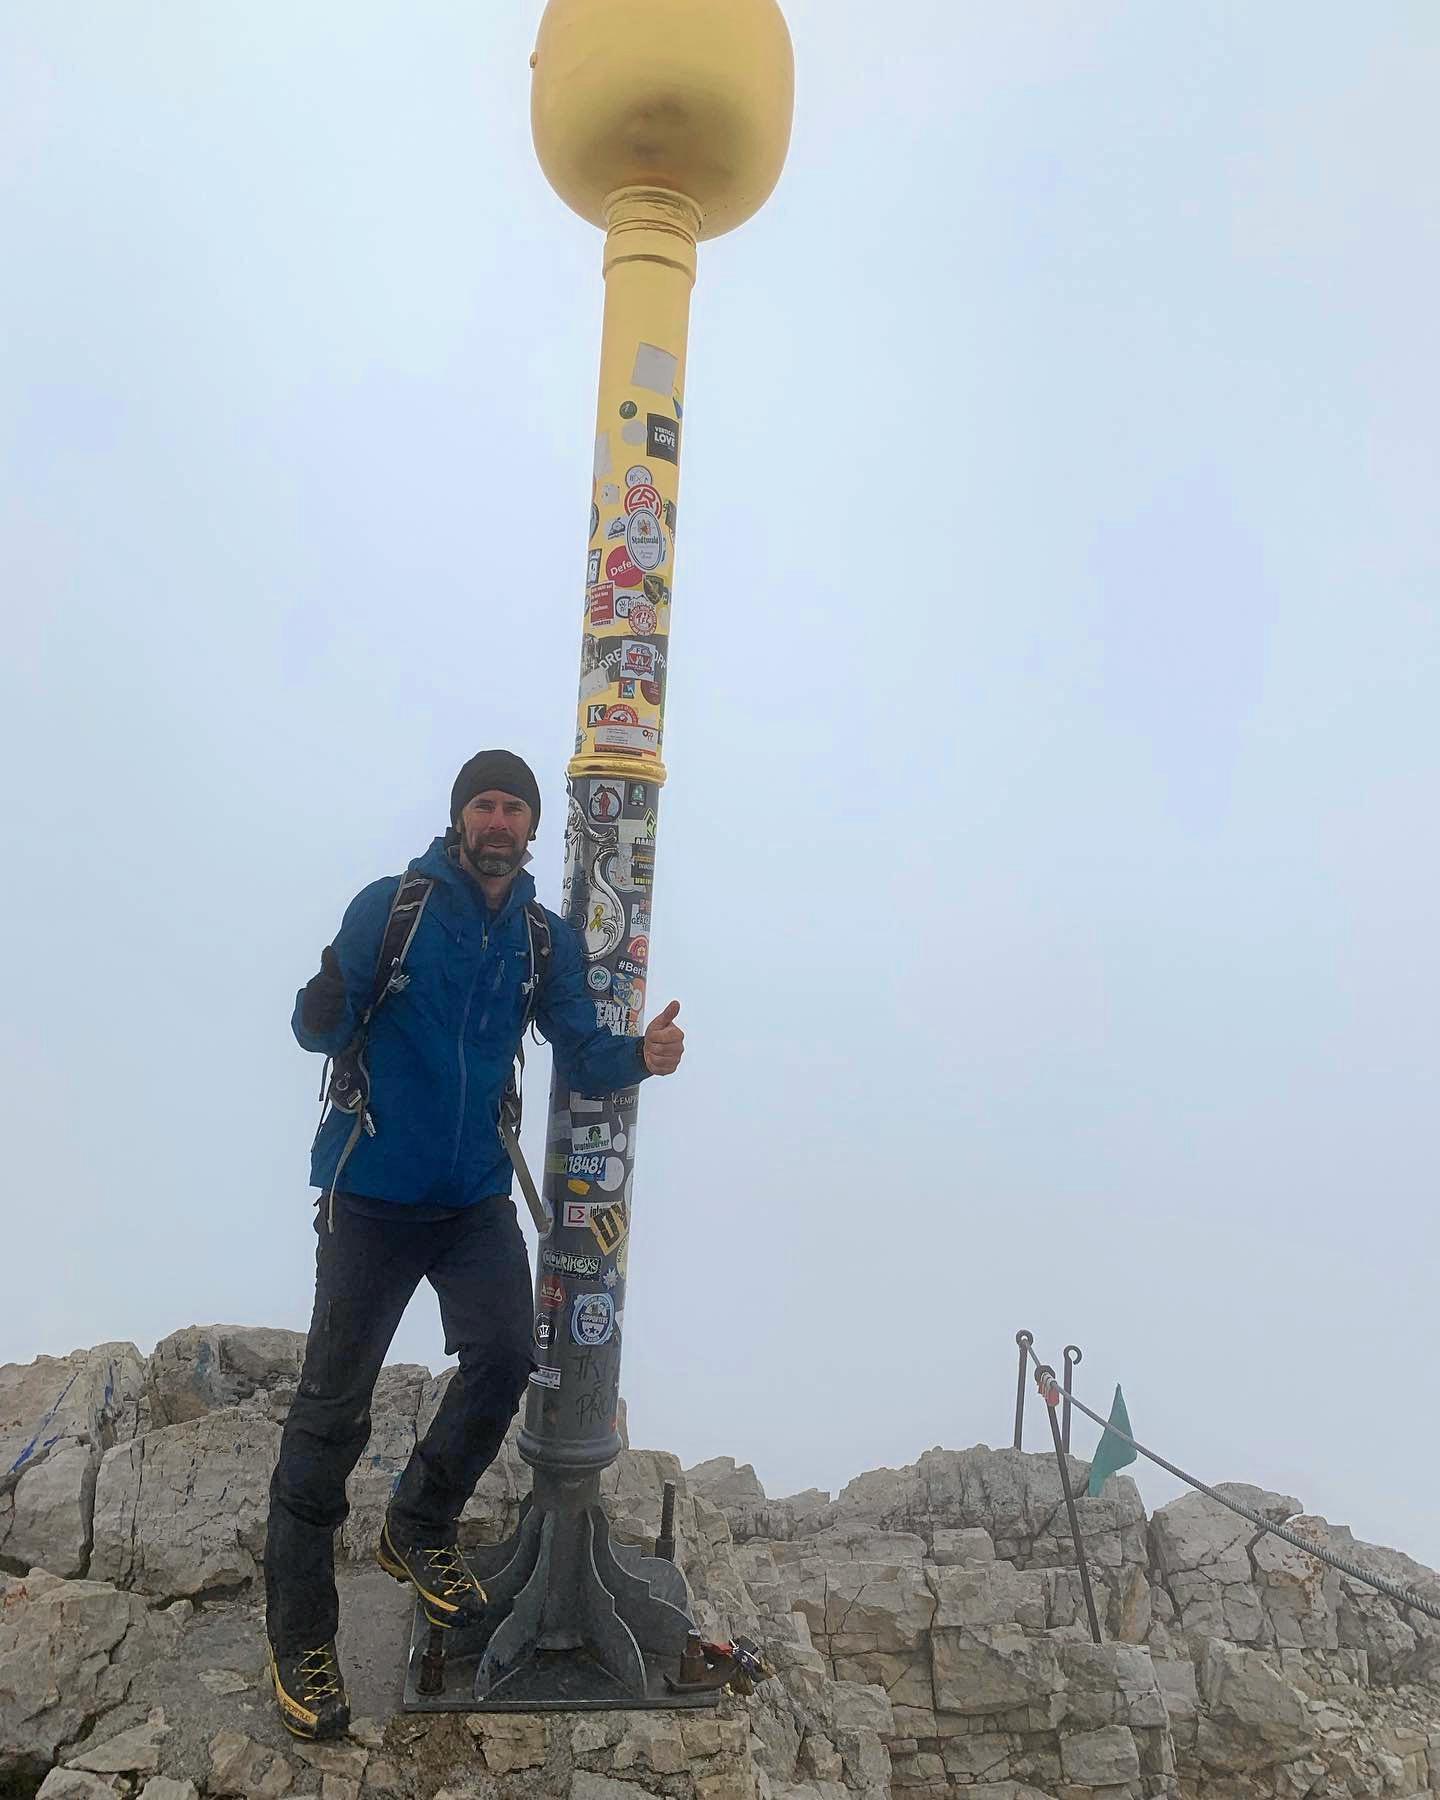 Ipswich climber Ricky Ellis climbed Zuqspitze.